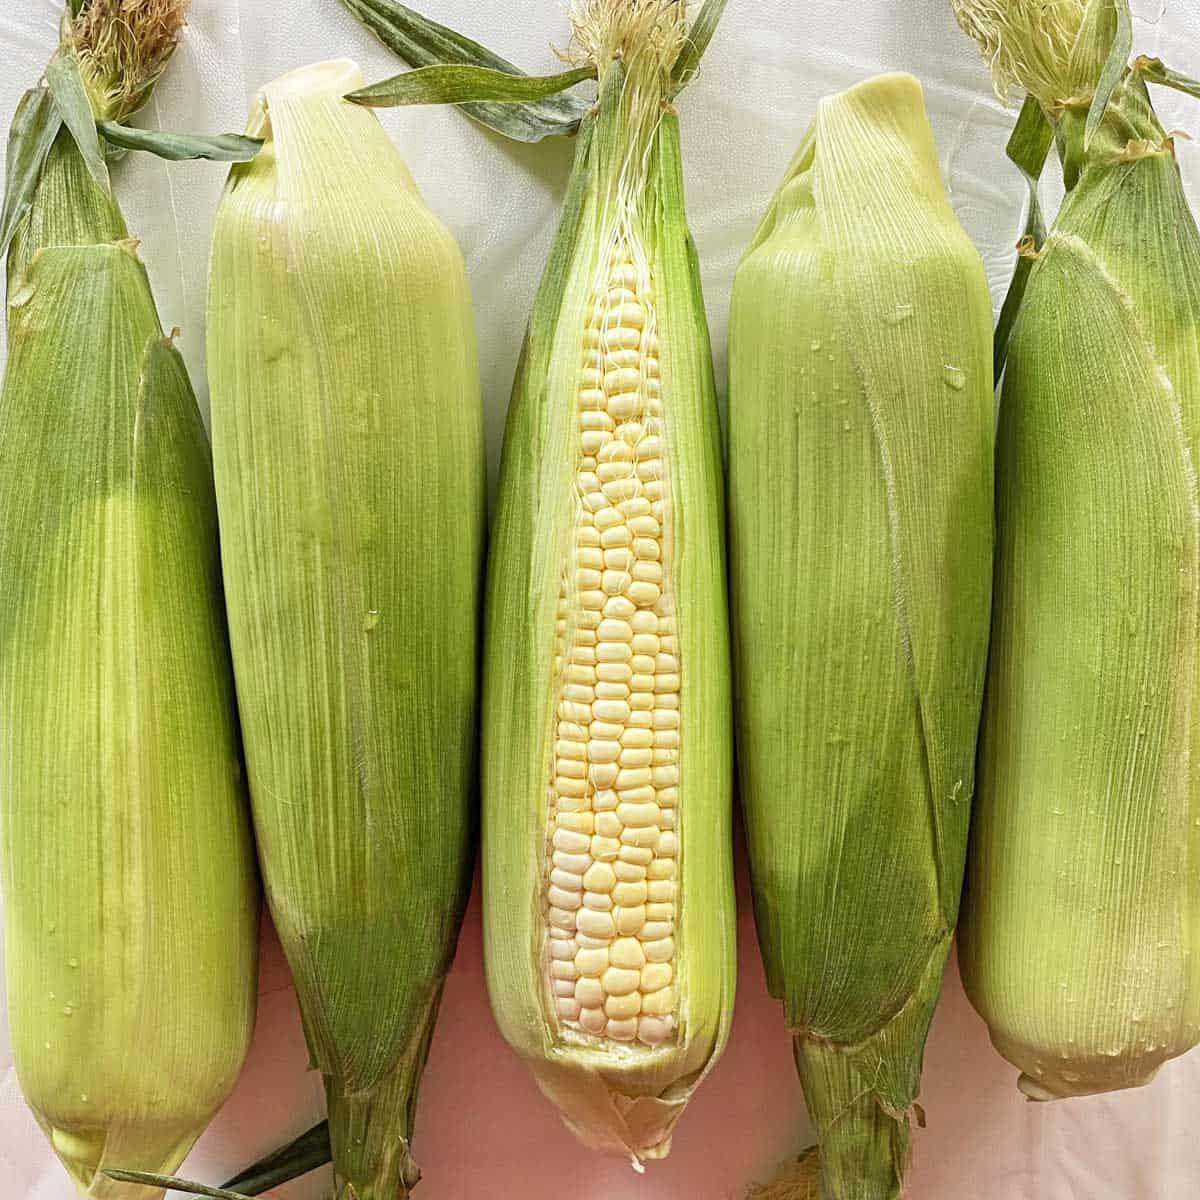 Five ears of unshucked corn